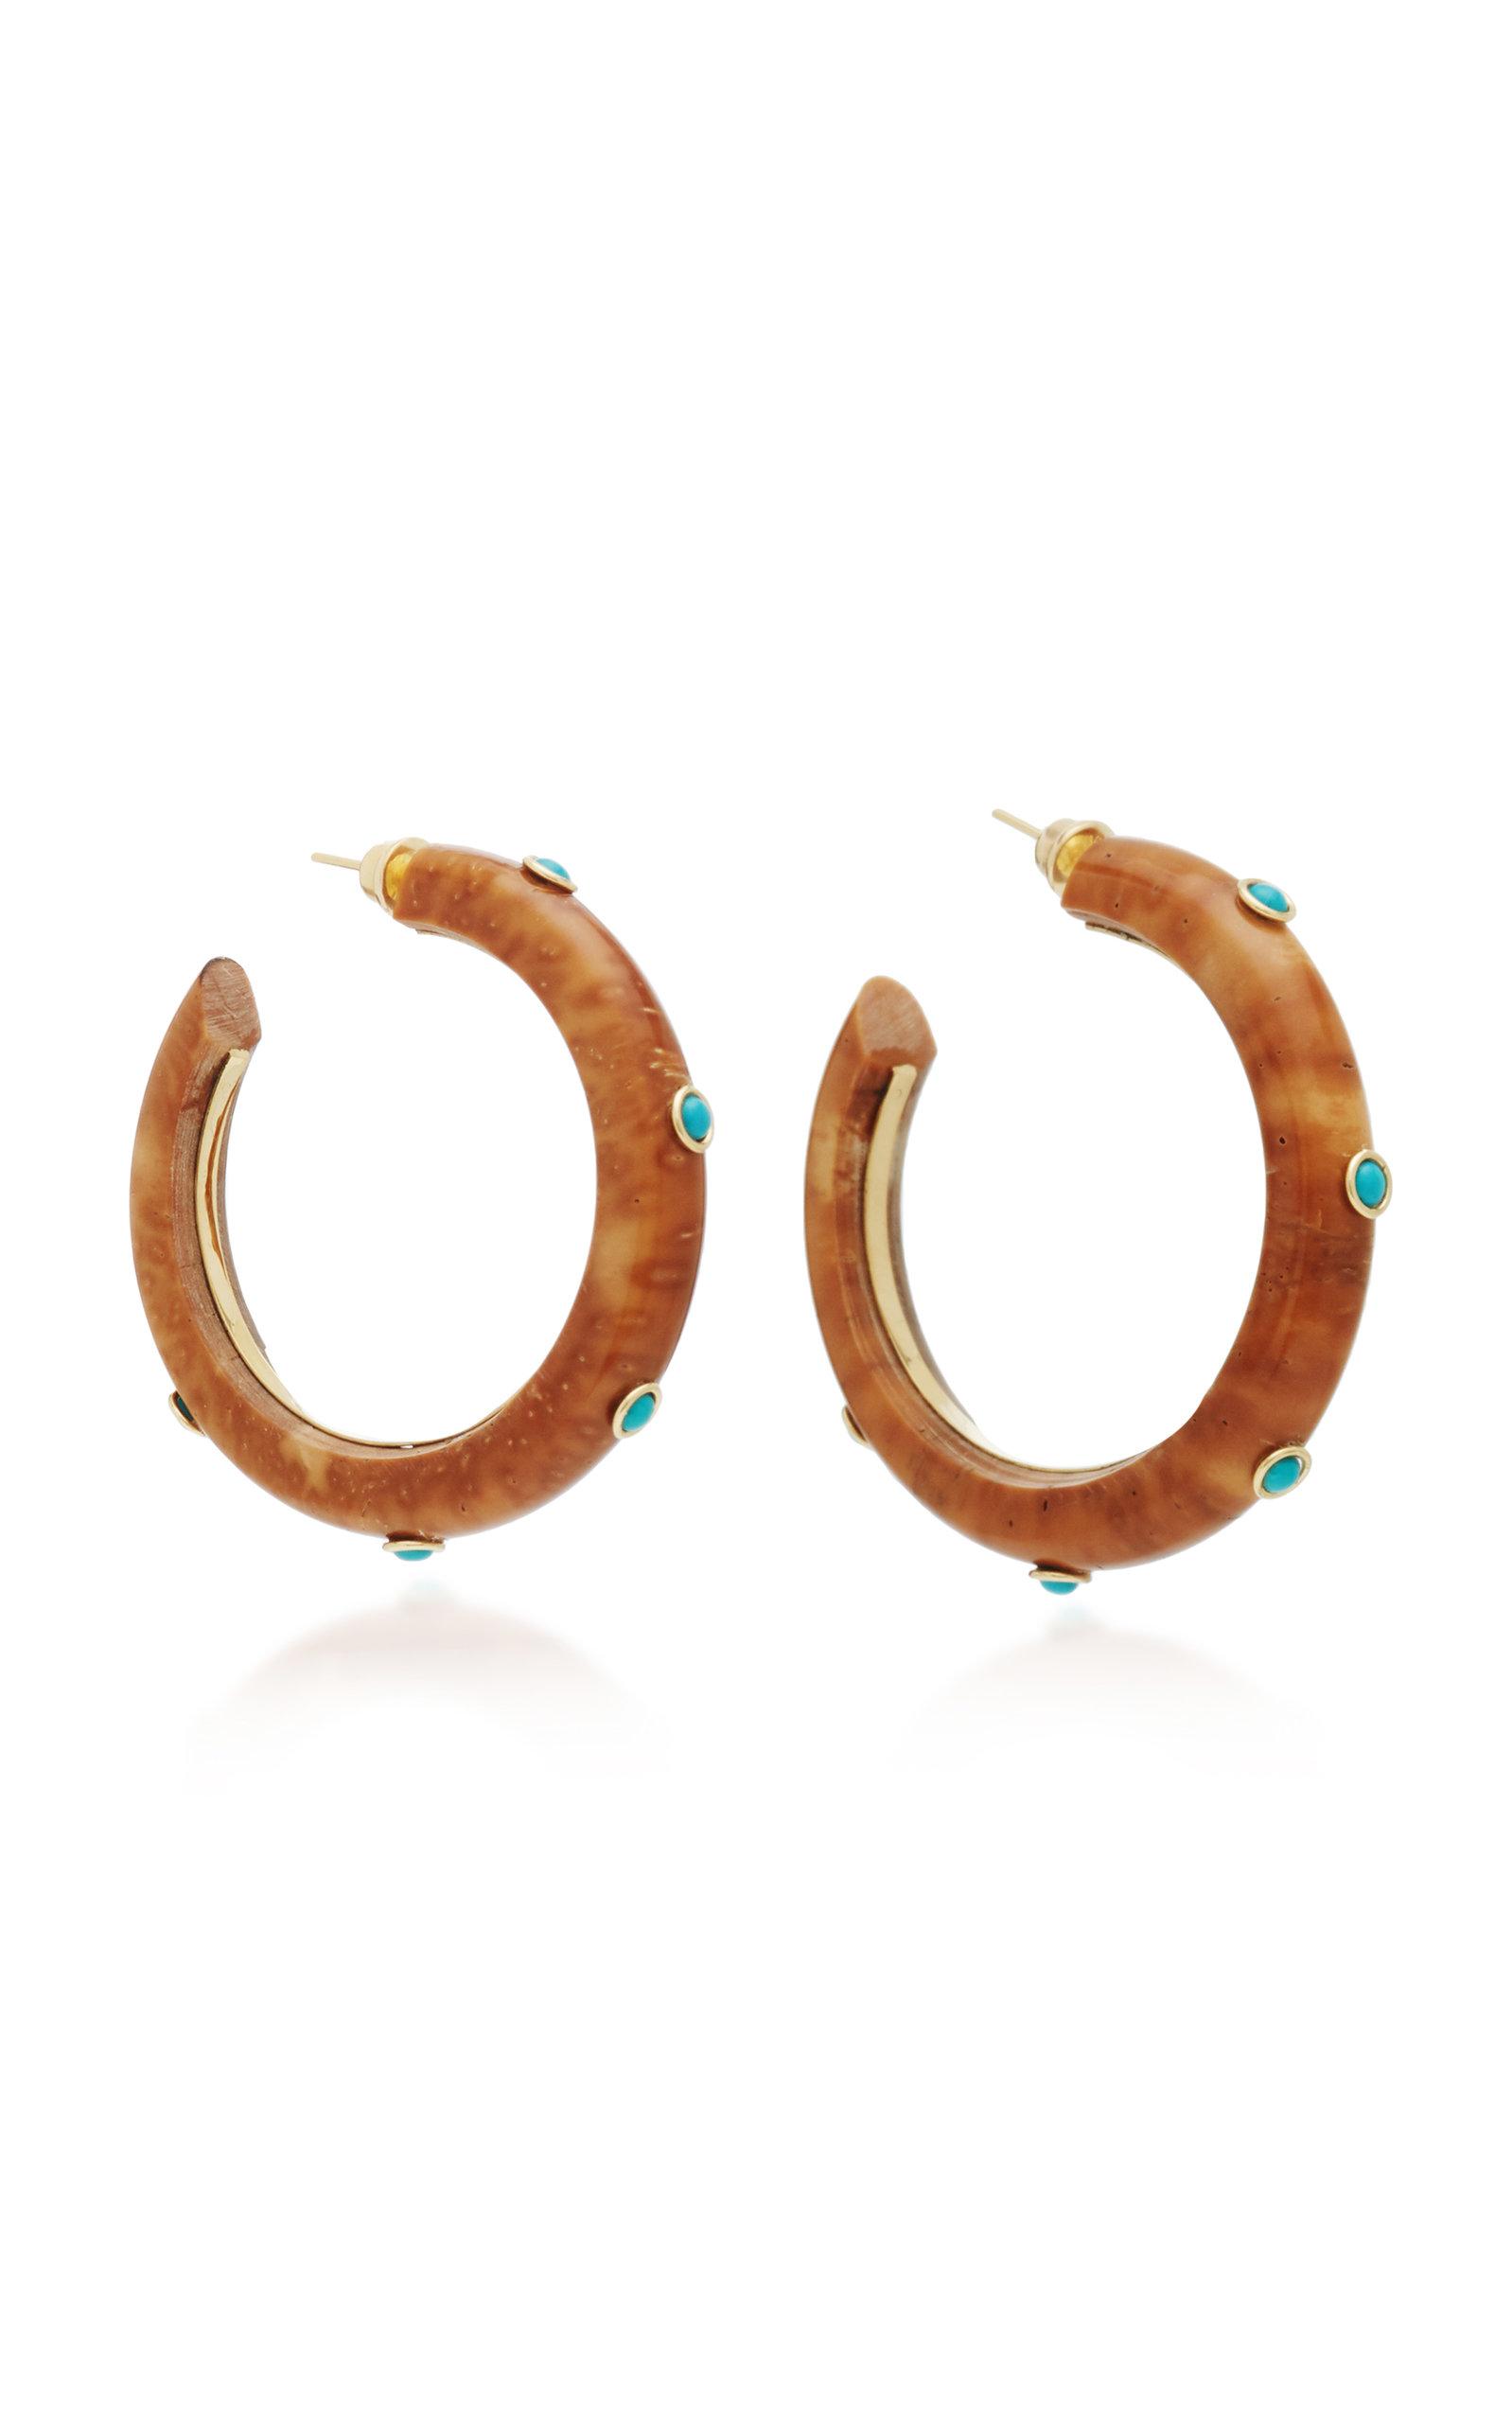 Eduarda Brunelli Accessories SAVANNAH 18K YELLOW GOLD SHELL TURQUOISE AND CRISOPAZIO EARRINGS